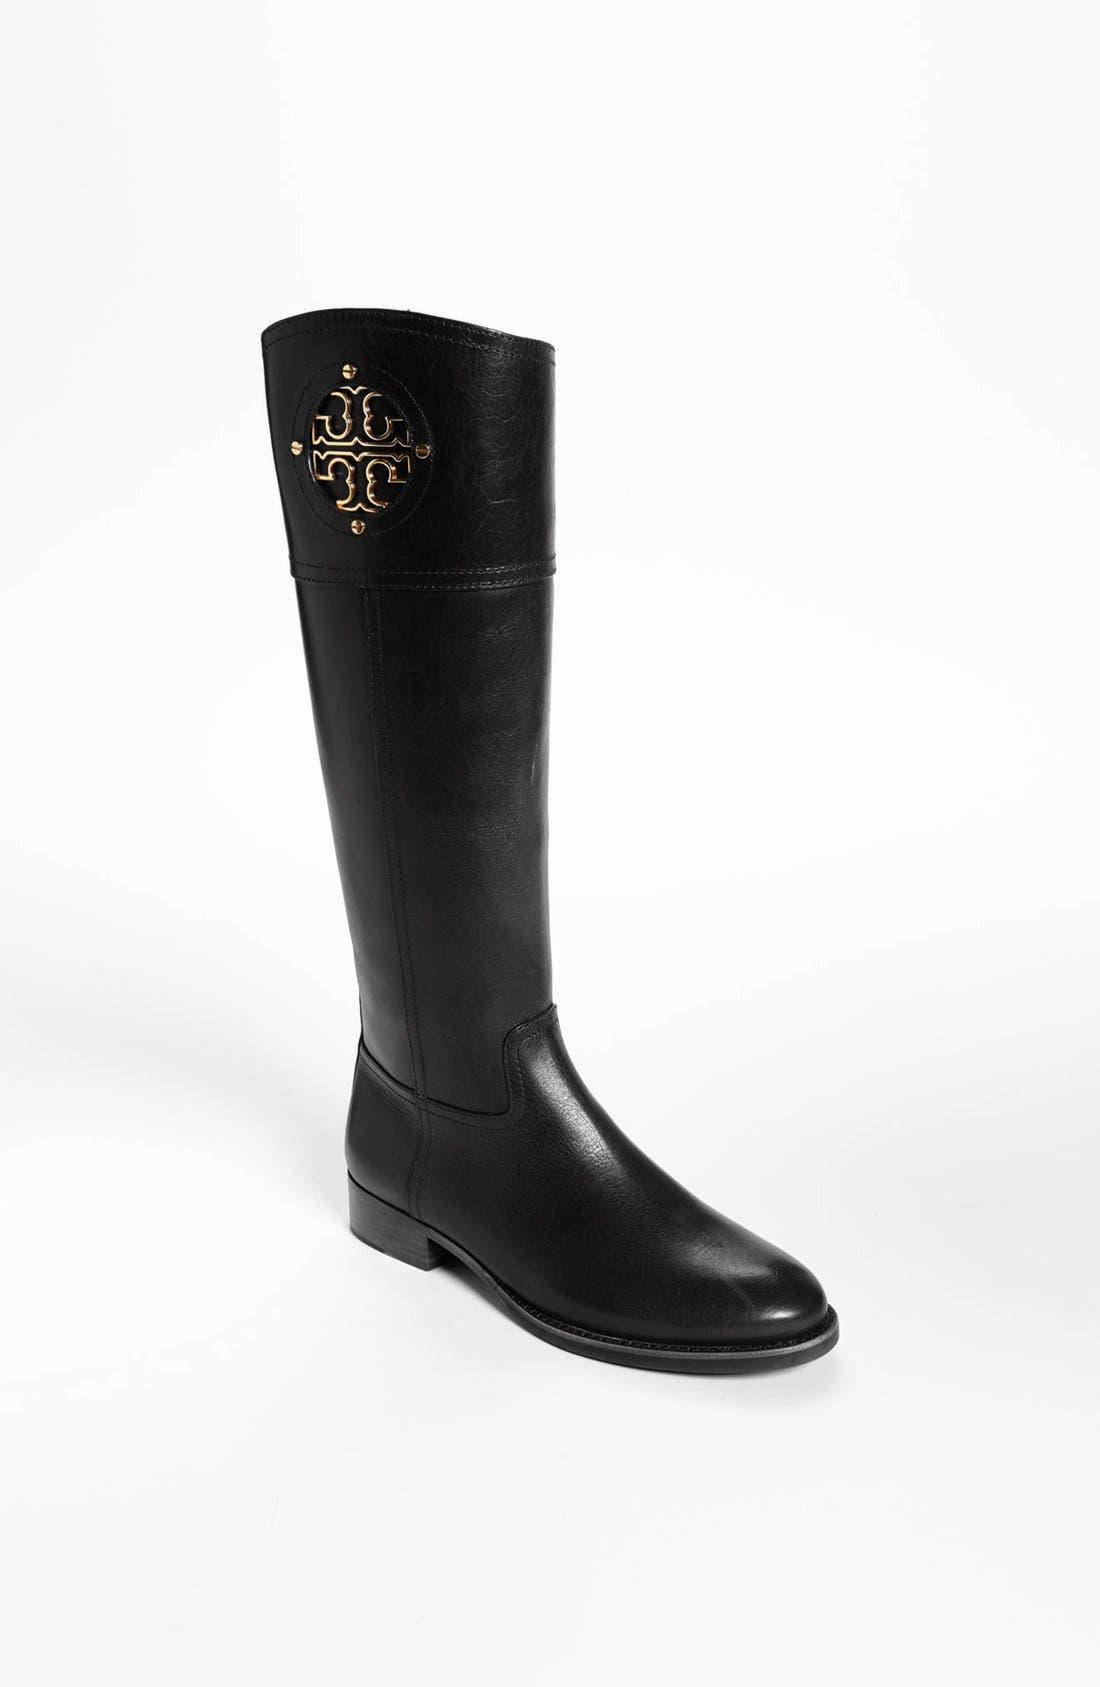 Alternate Image 1 Selected - Tory Burch 'Kiernan' Boot